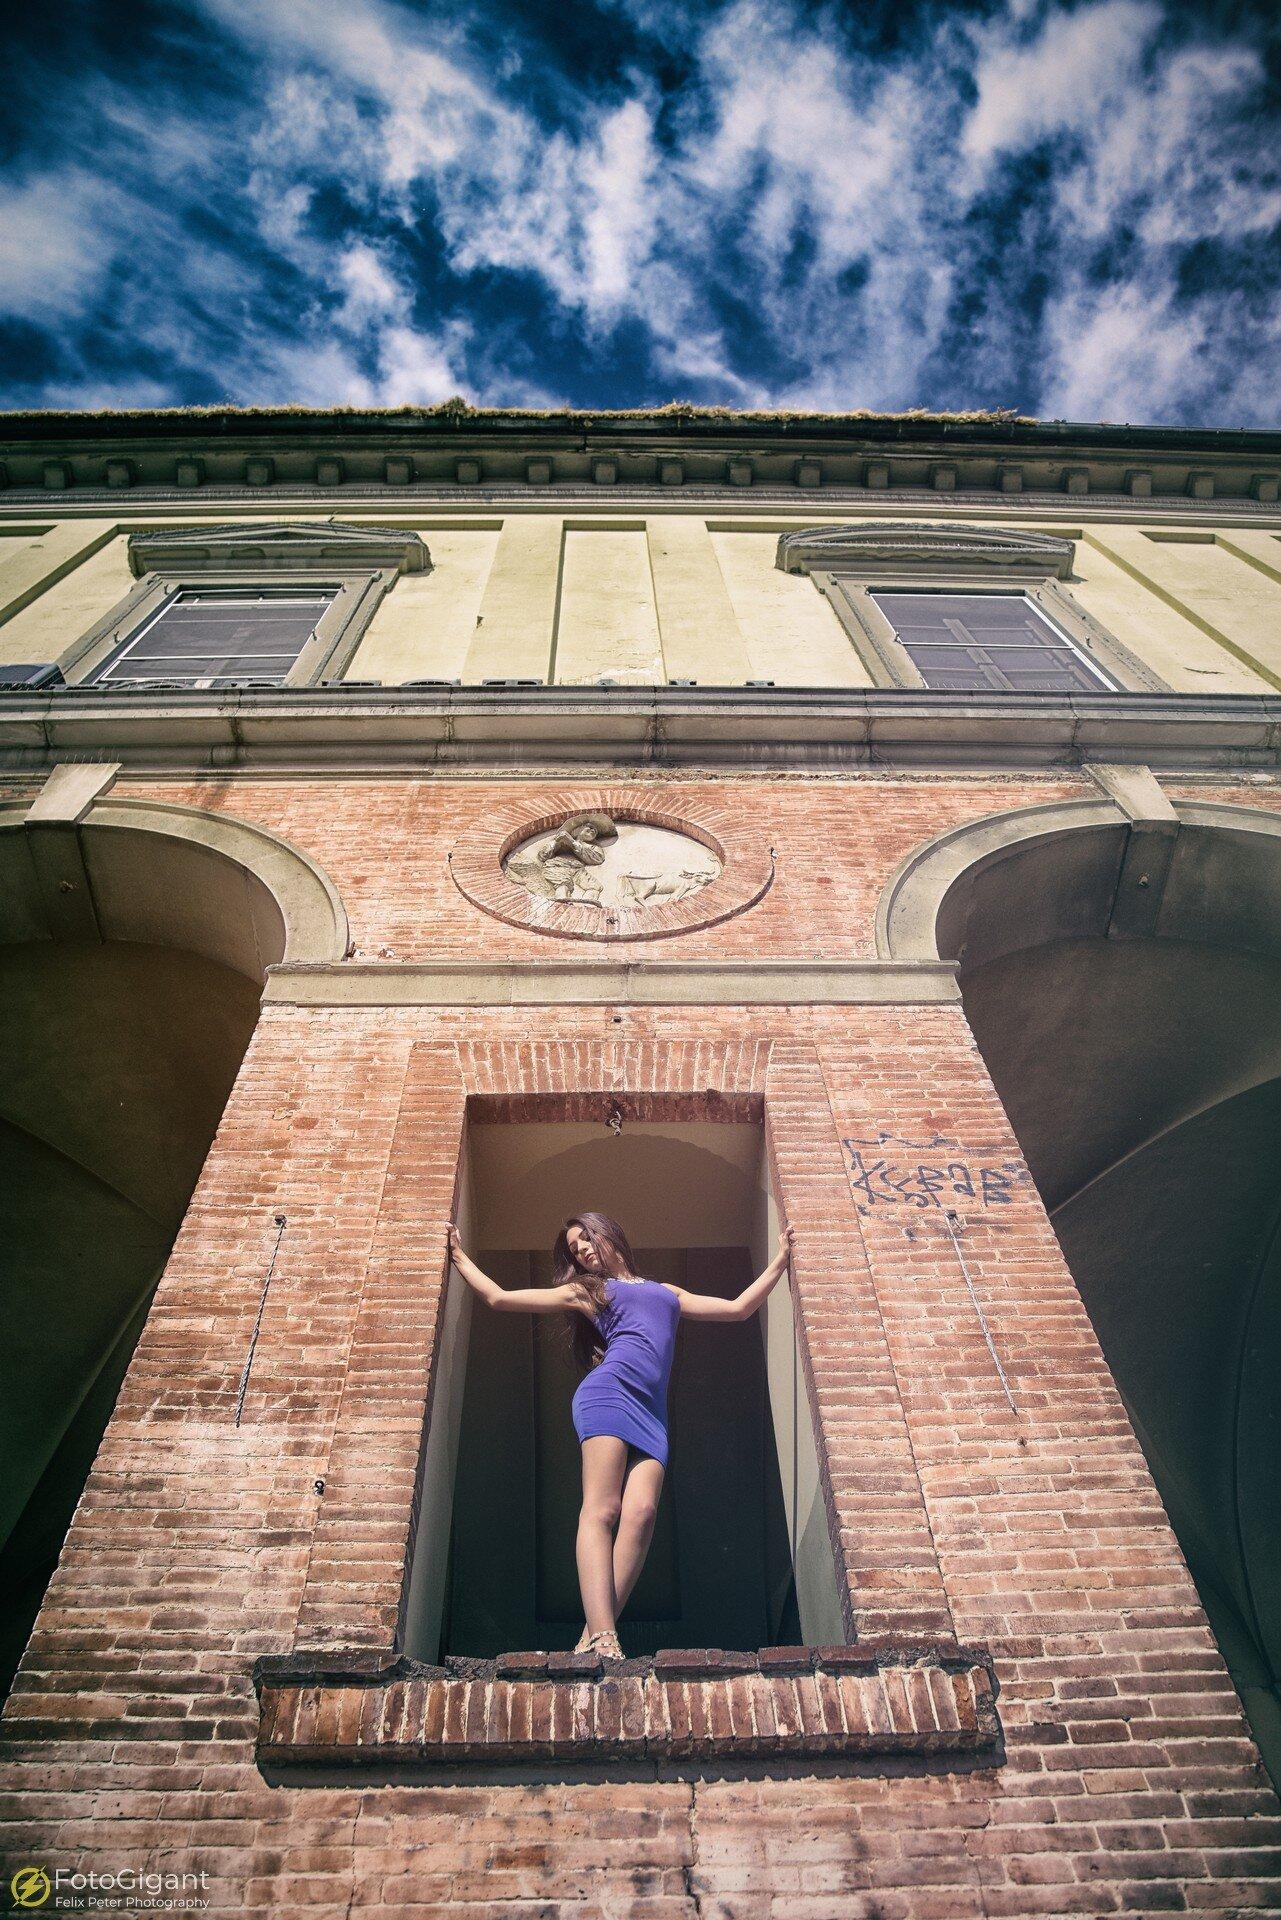 Firenze-Photography-Workshop_08.jpg